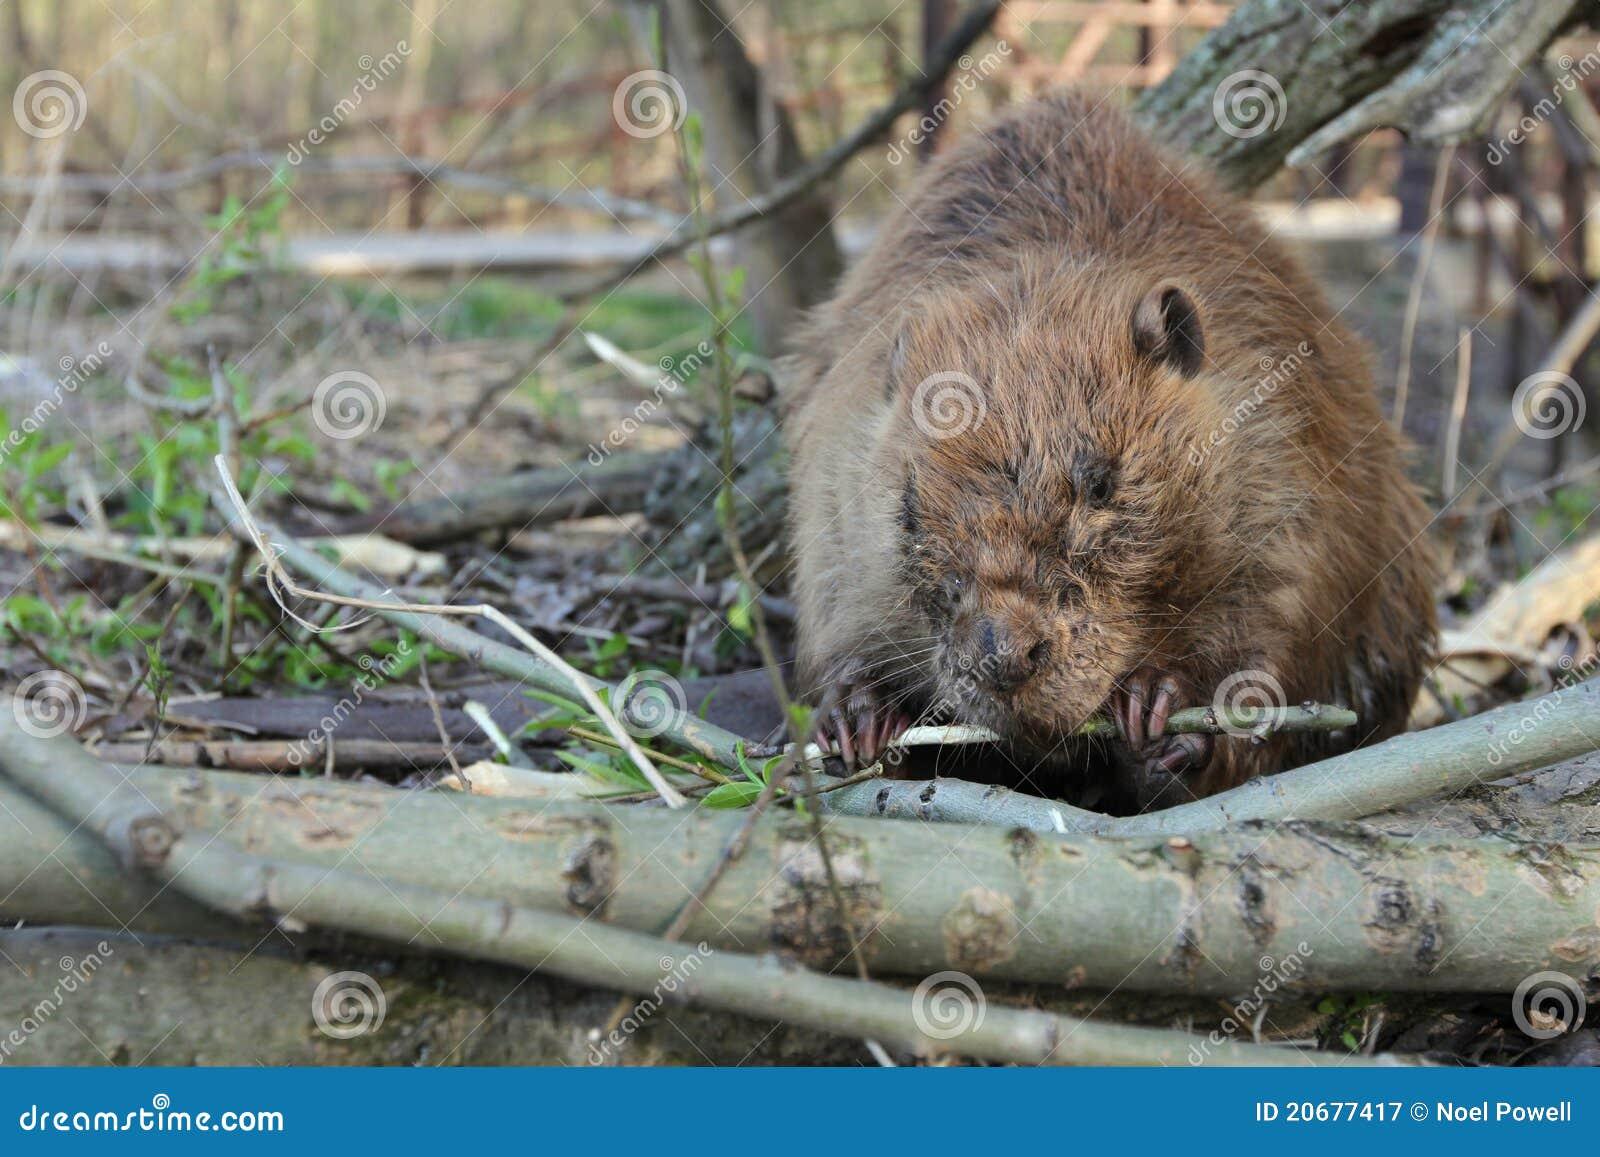 Beaver Eating Tree Bark Stock Image Image Of Trunk